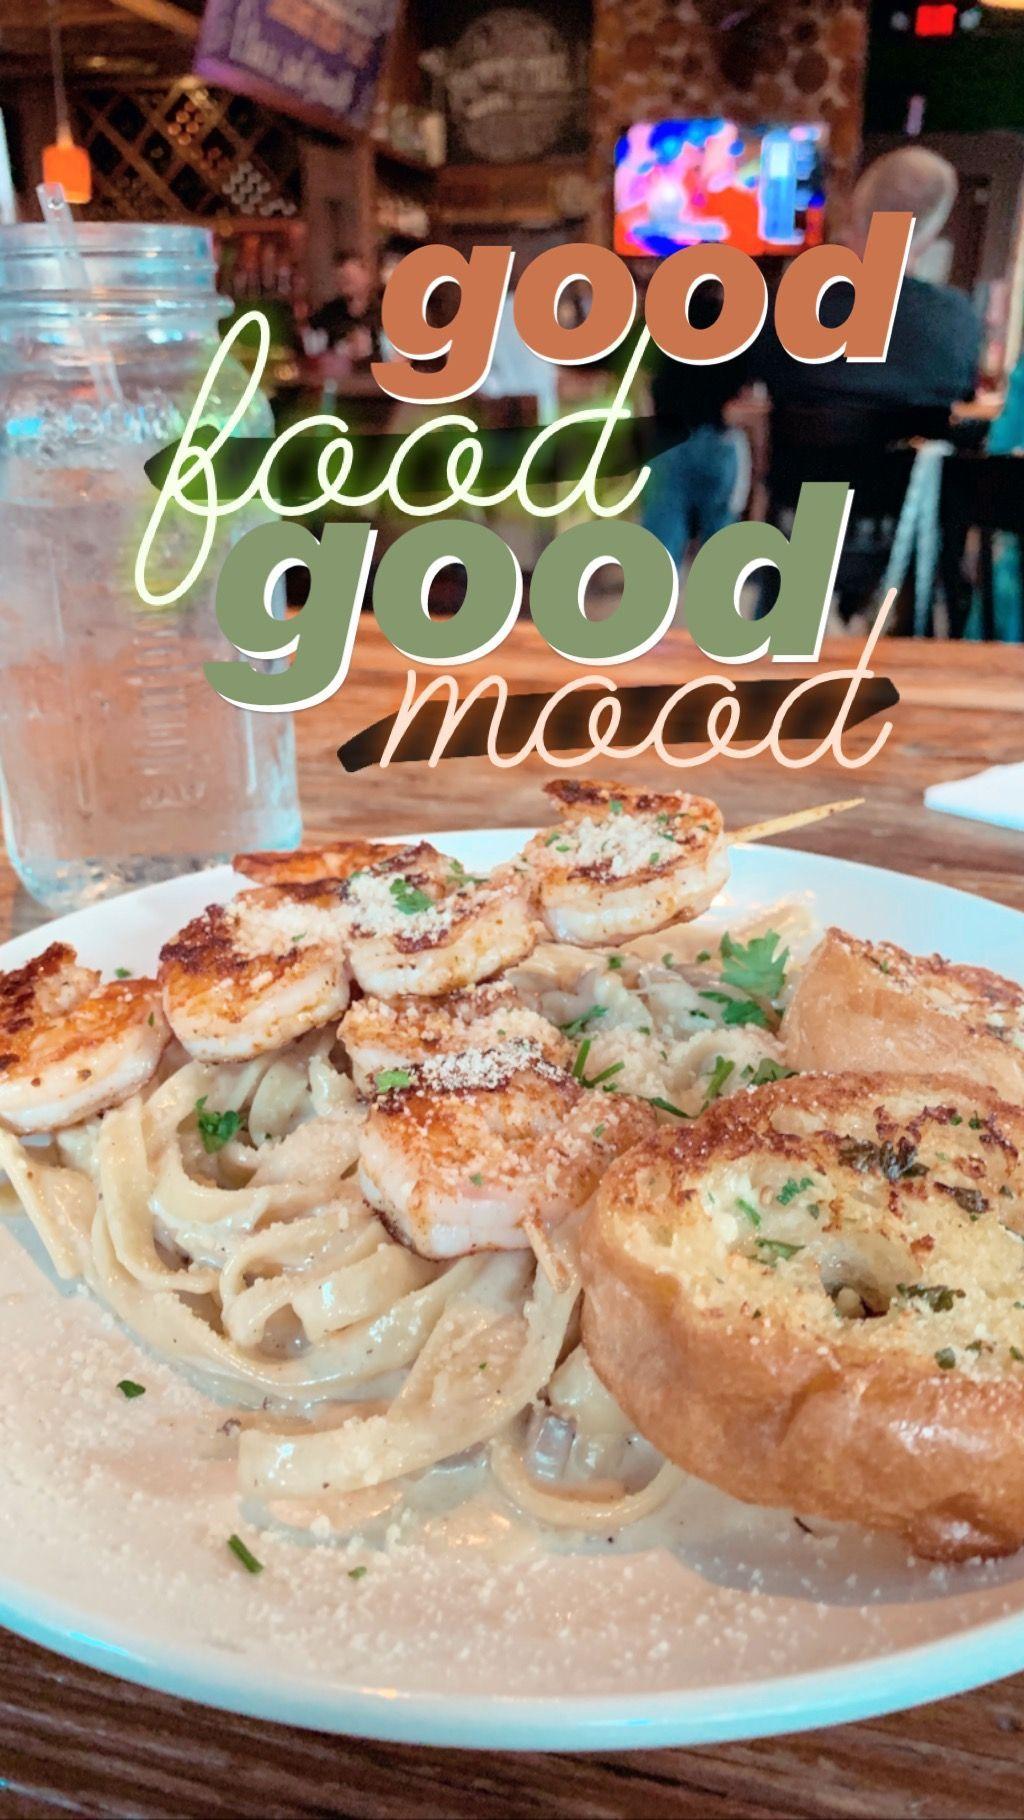 Instagram Story Art Design Inspiration Pasta Text Art Instagram Food Instagram Story Ideas Instagram Story